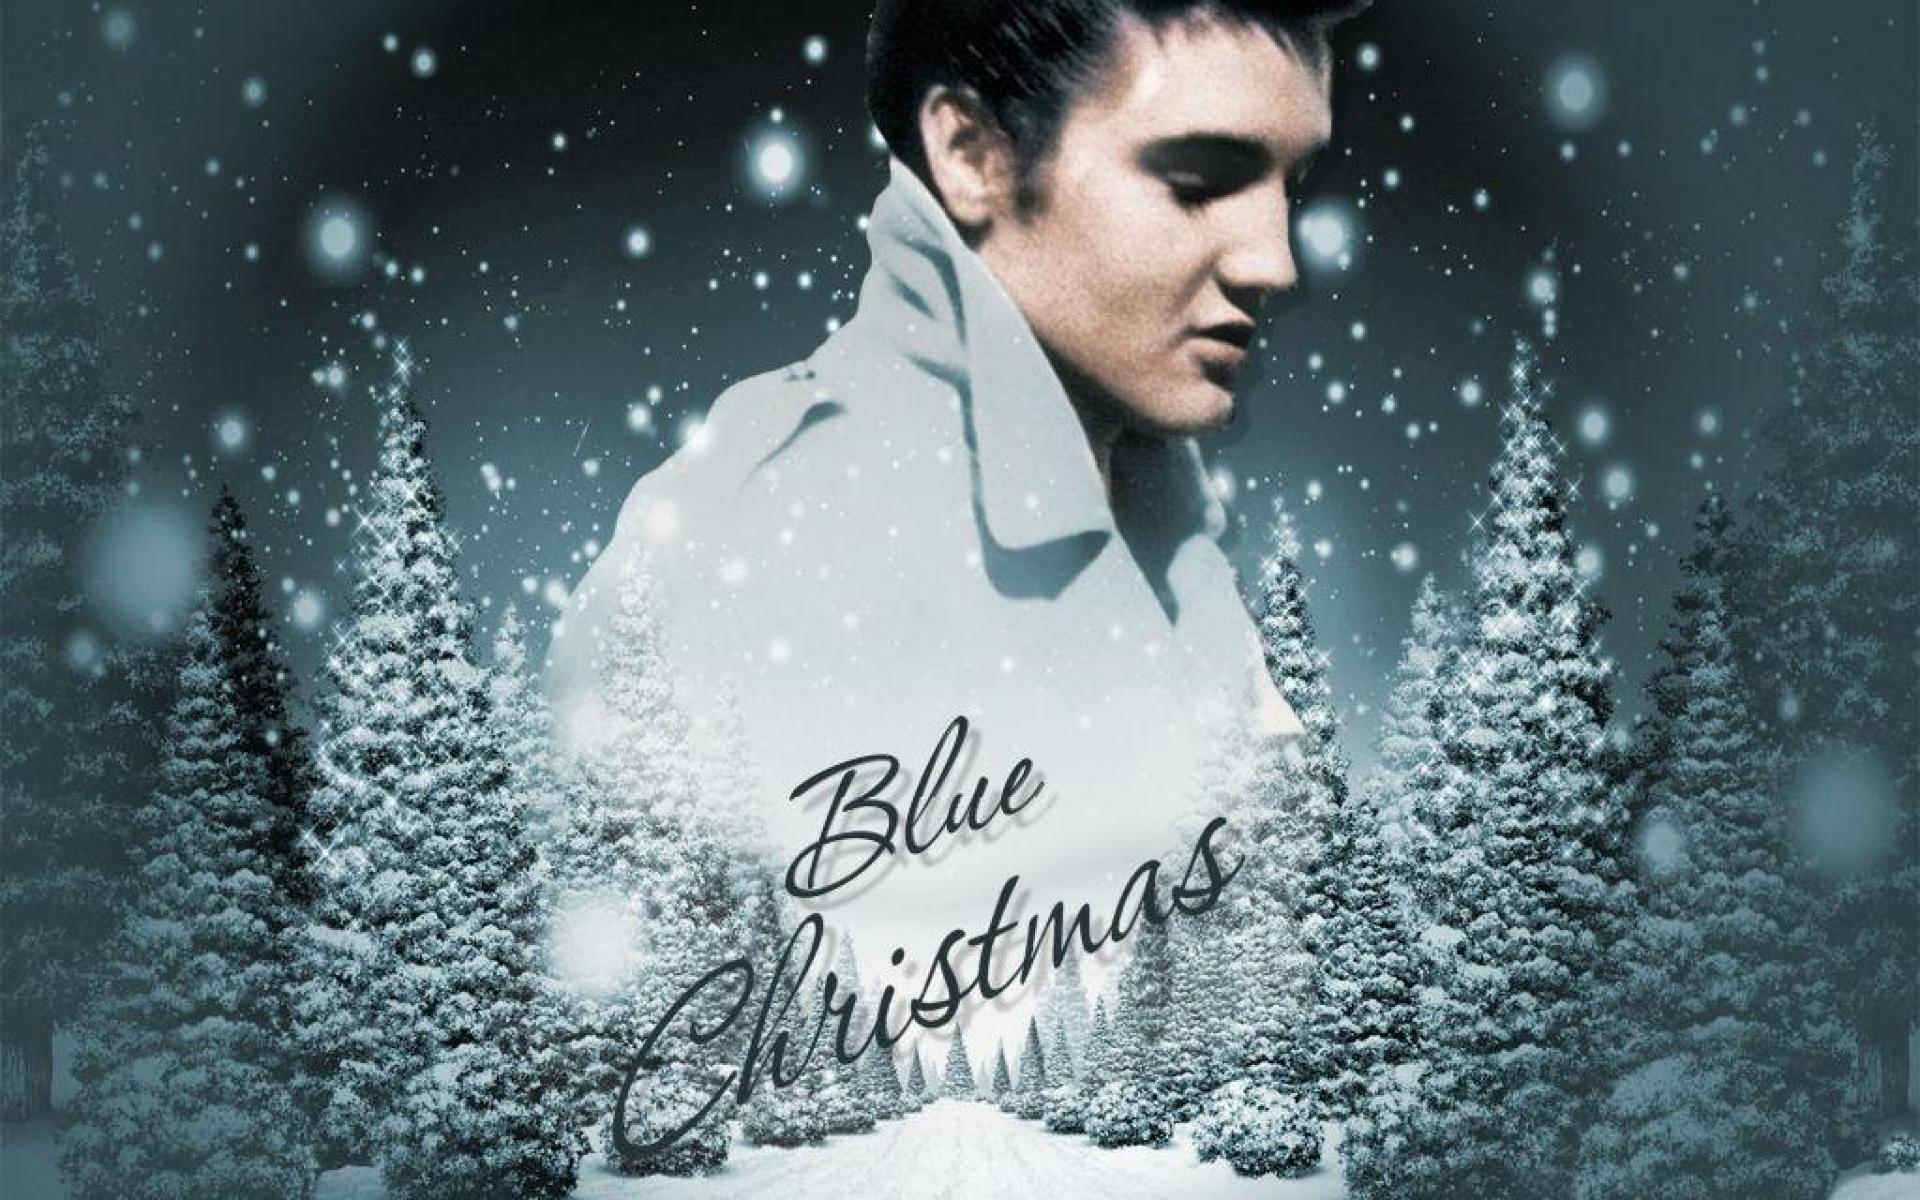 blue christmas elvis presley video